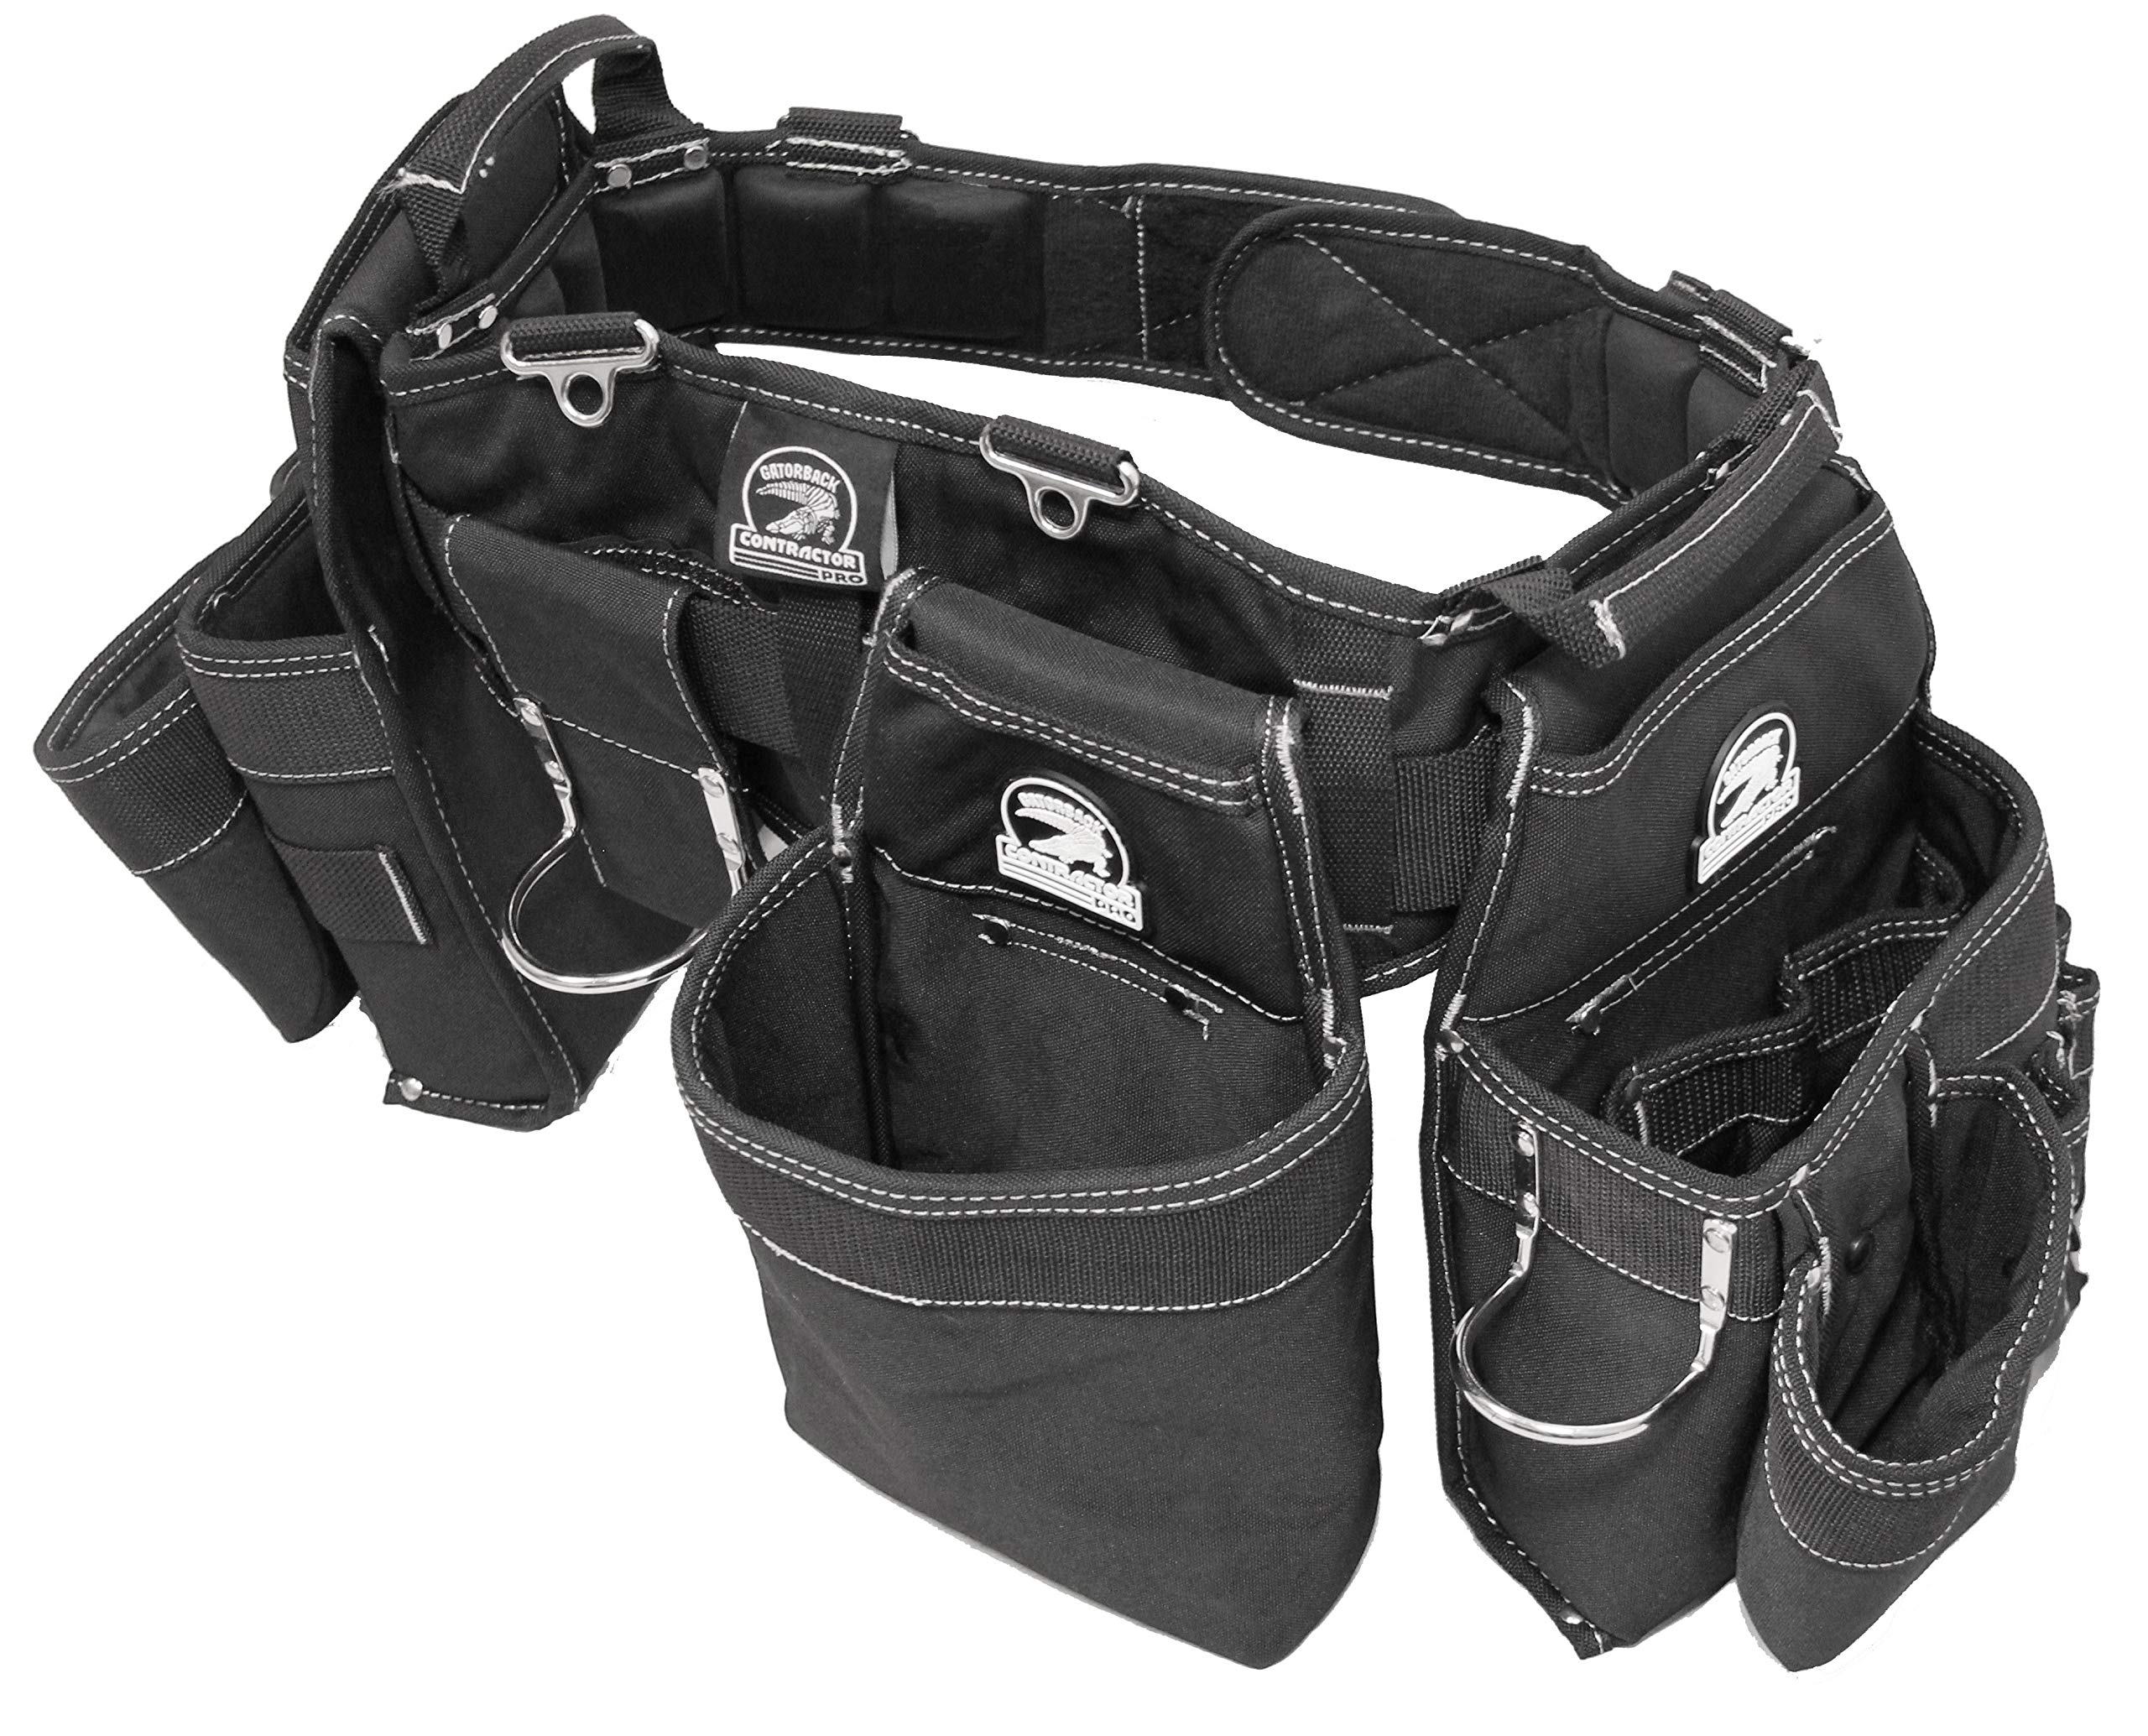 Gatorback B145 Carpenters Triple Combo w/Pro-Comfort Back Support Belt